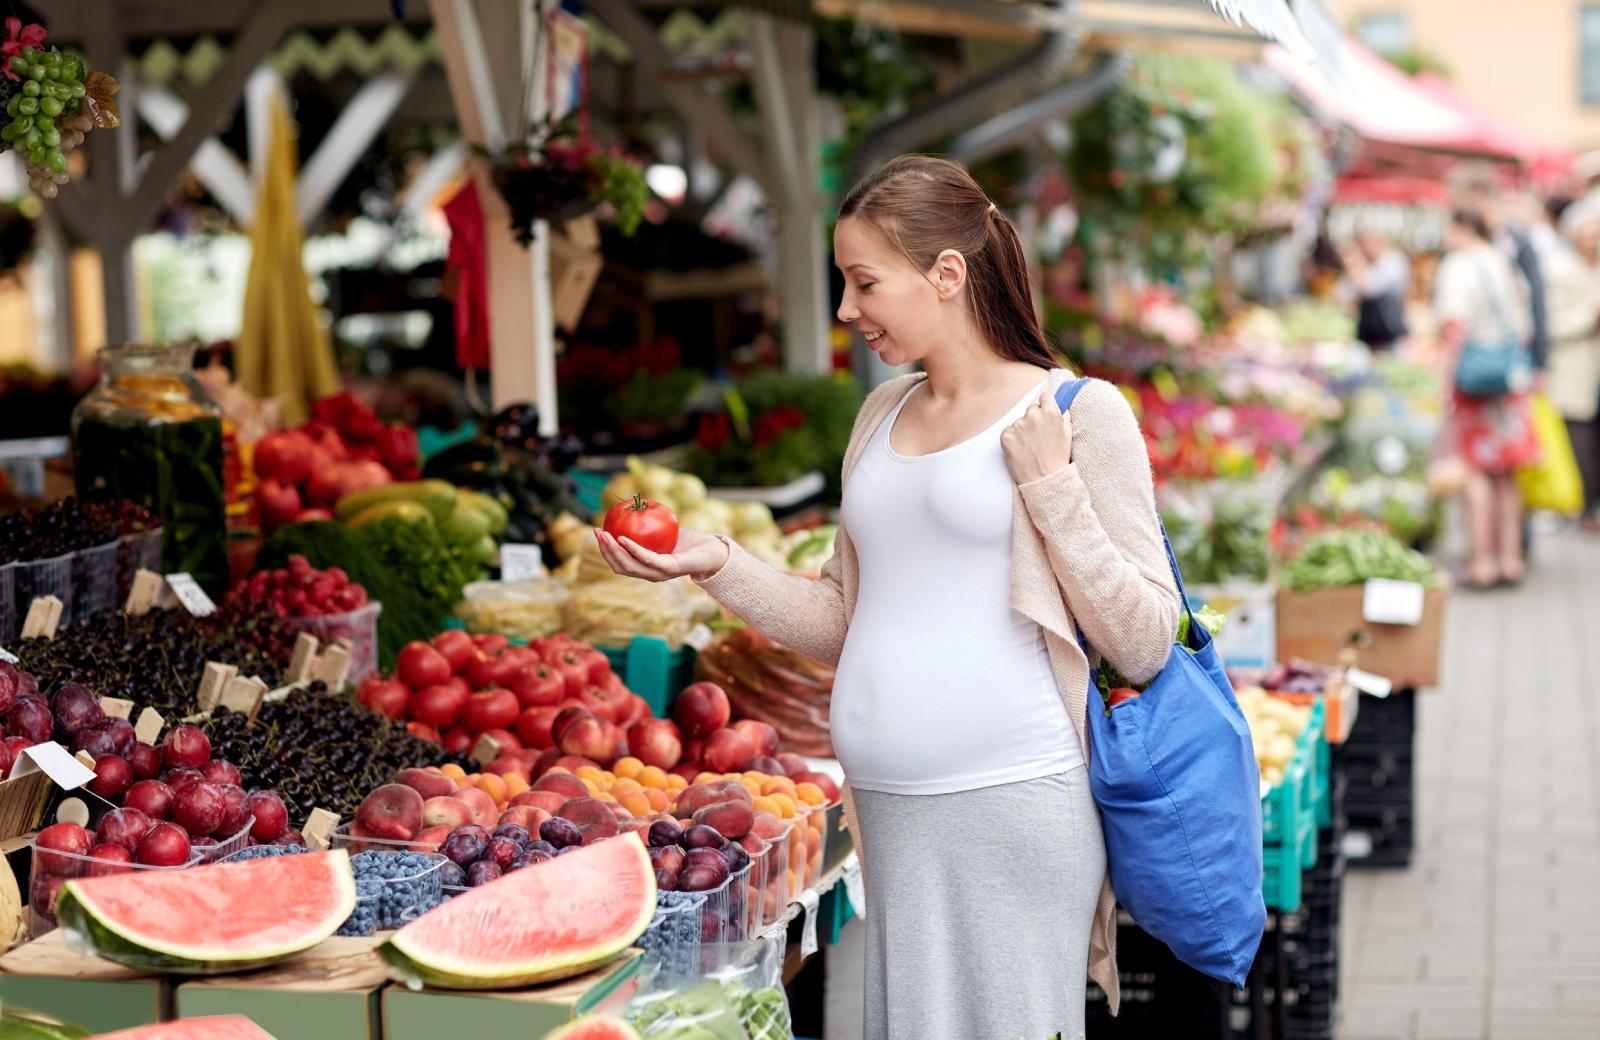 Mountain View Farmers Market - The Village Residences Apts